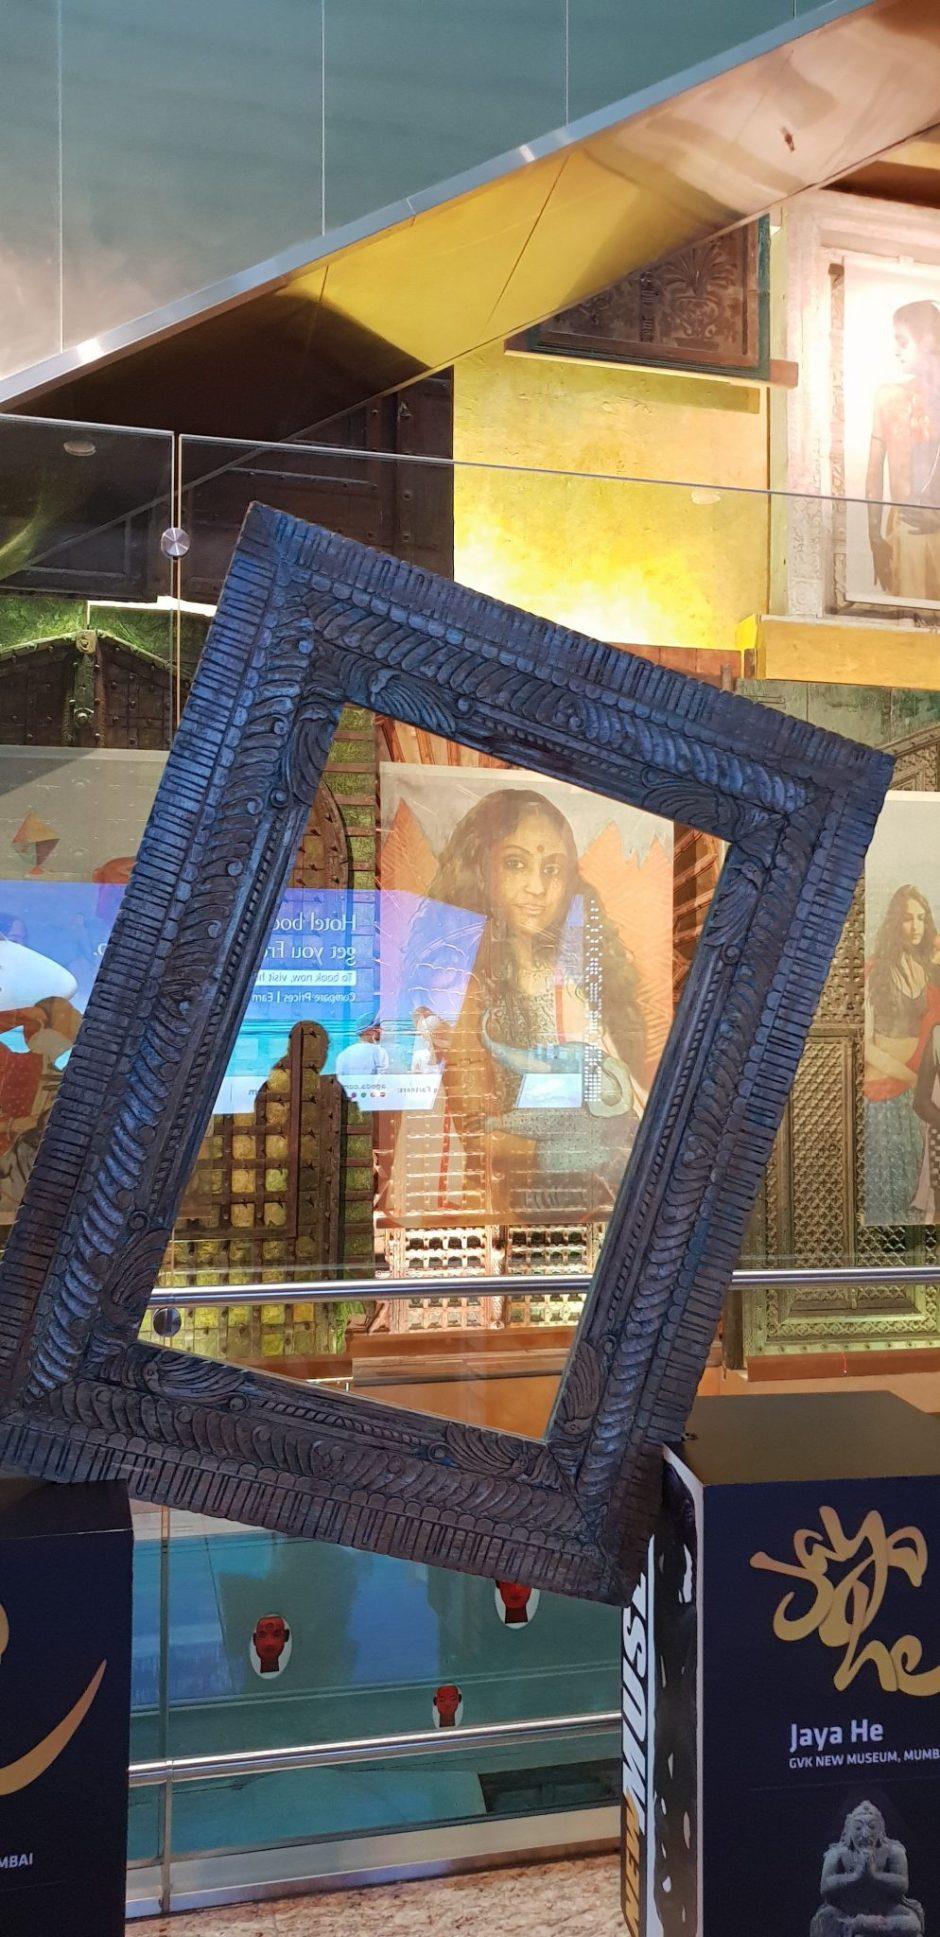 JayaHe GVK New Museum Art Tour at Mumbai Chhatrapati Shivaji International Airport